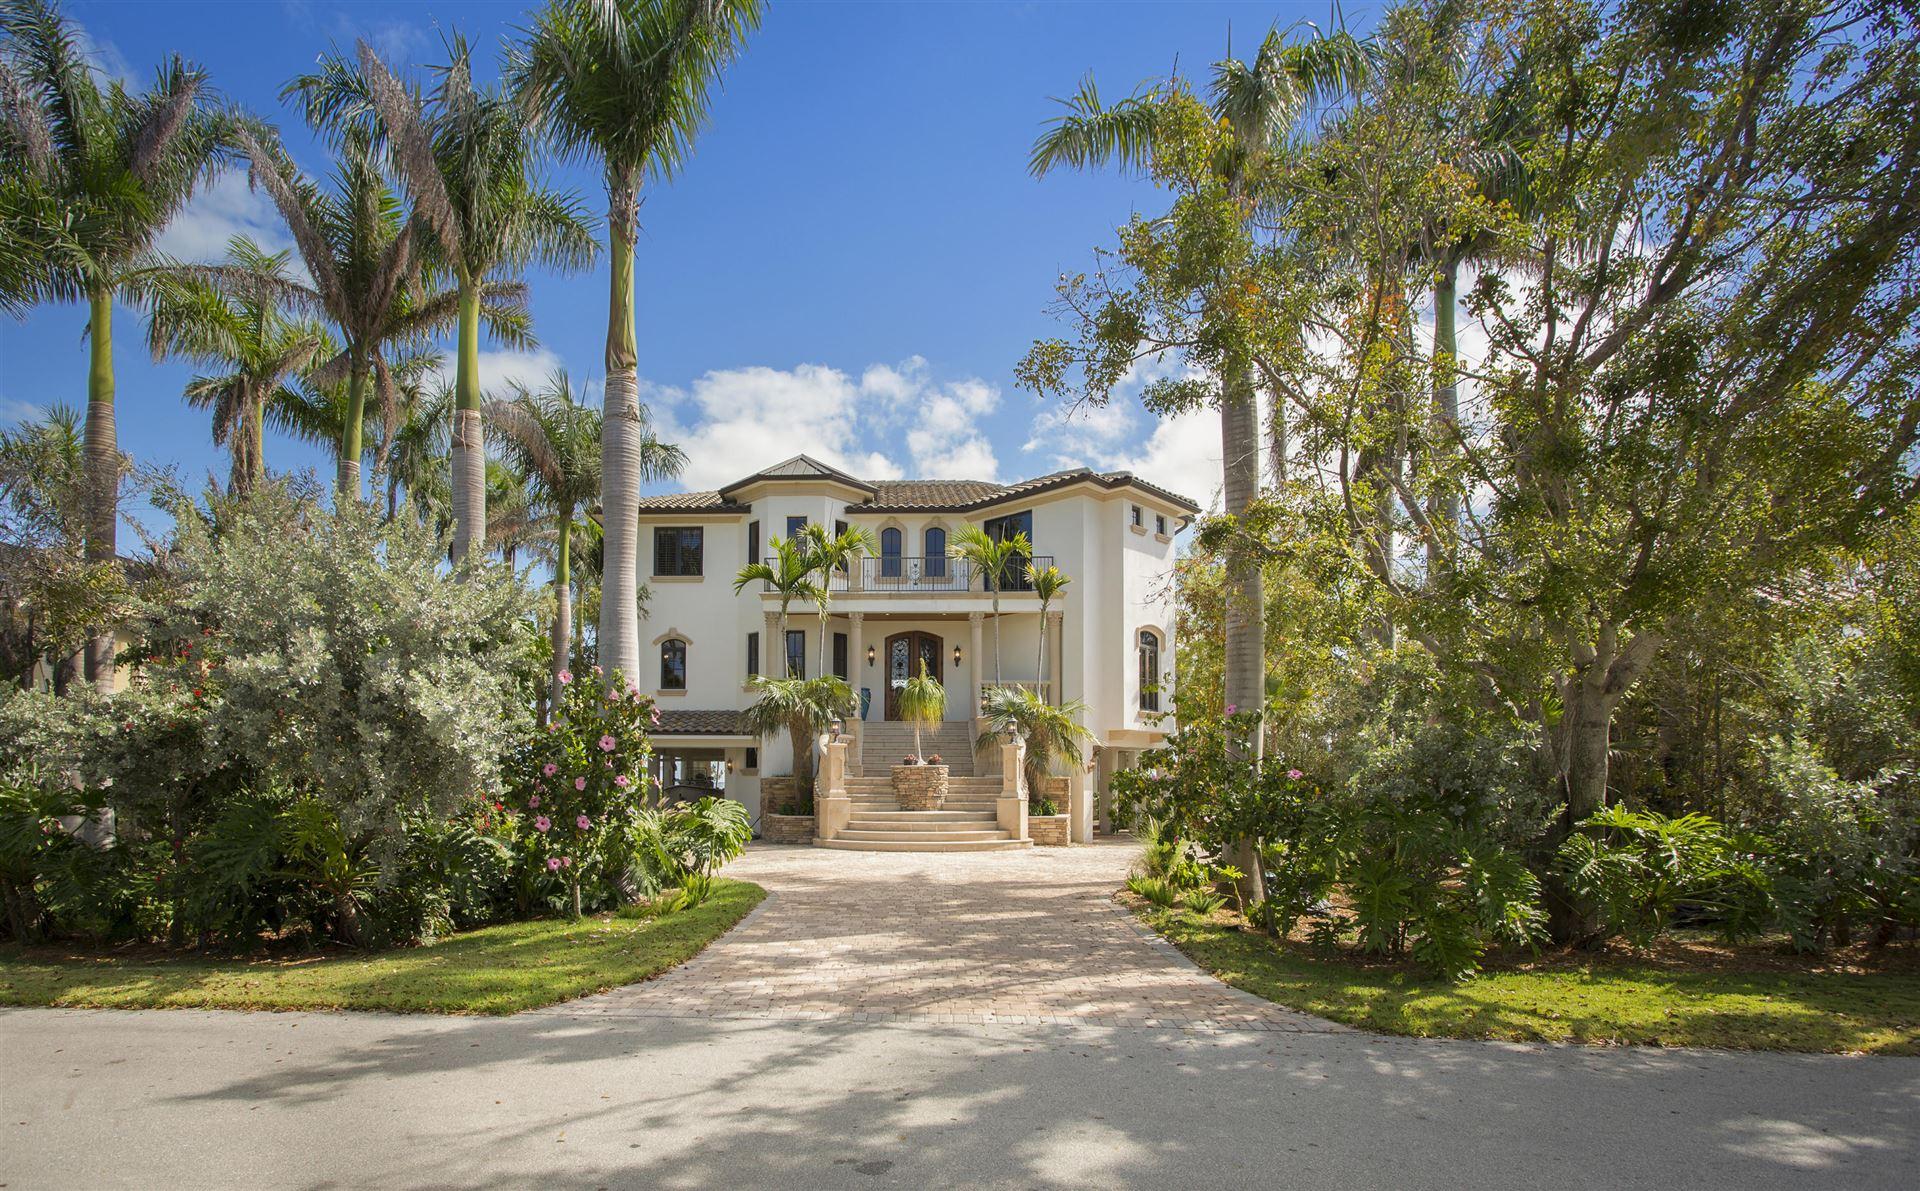 49 Cannon Royal Drive, Key West, FL 33040 - #: 592235